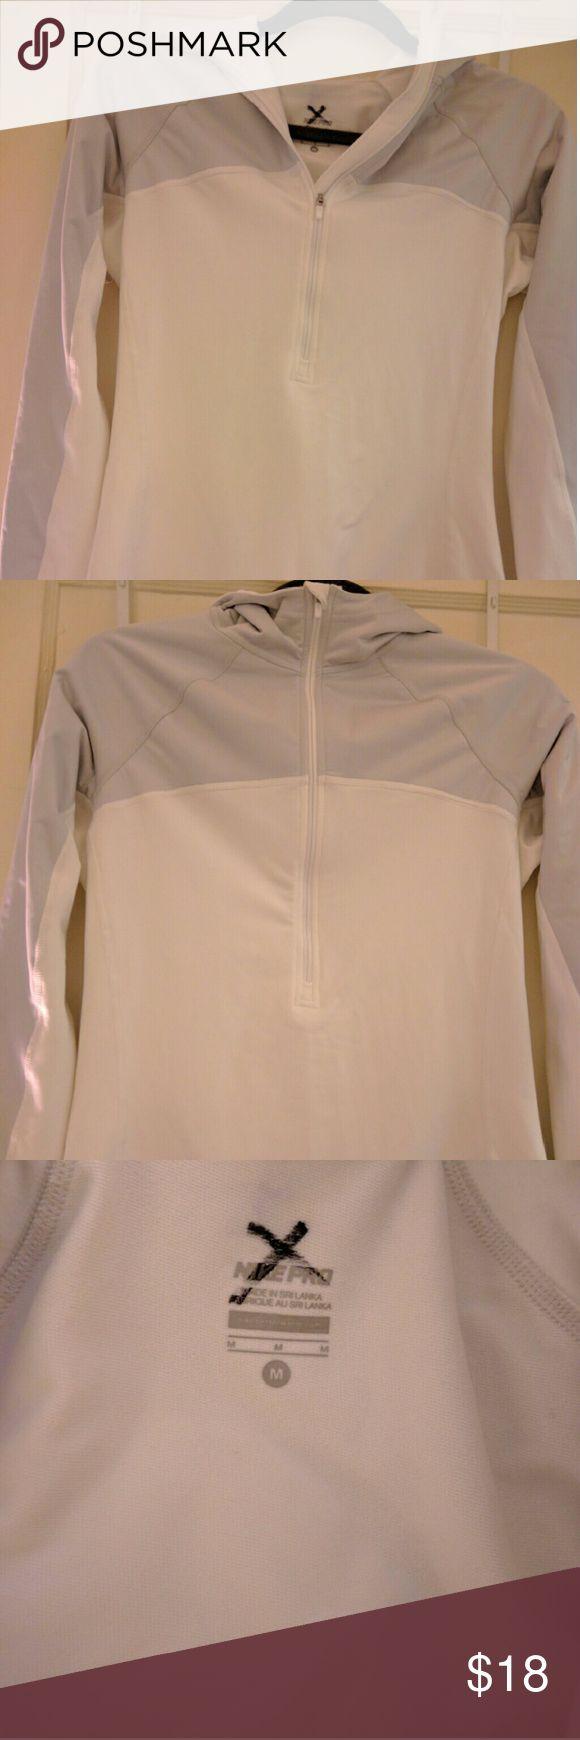 Nike pullover hoodie. Fairly thick Nike pullover. Never worn. NWOT Nike Tops Sweatshirts & Hoodies